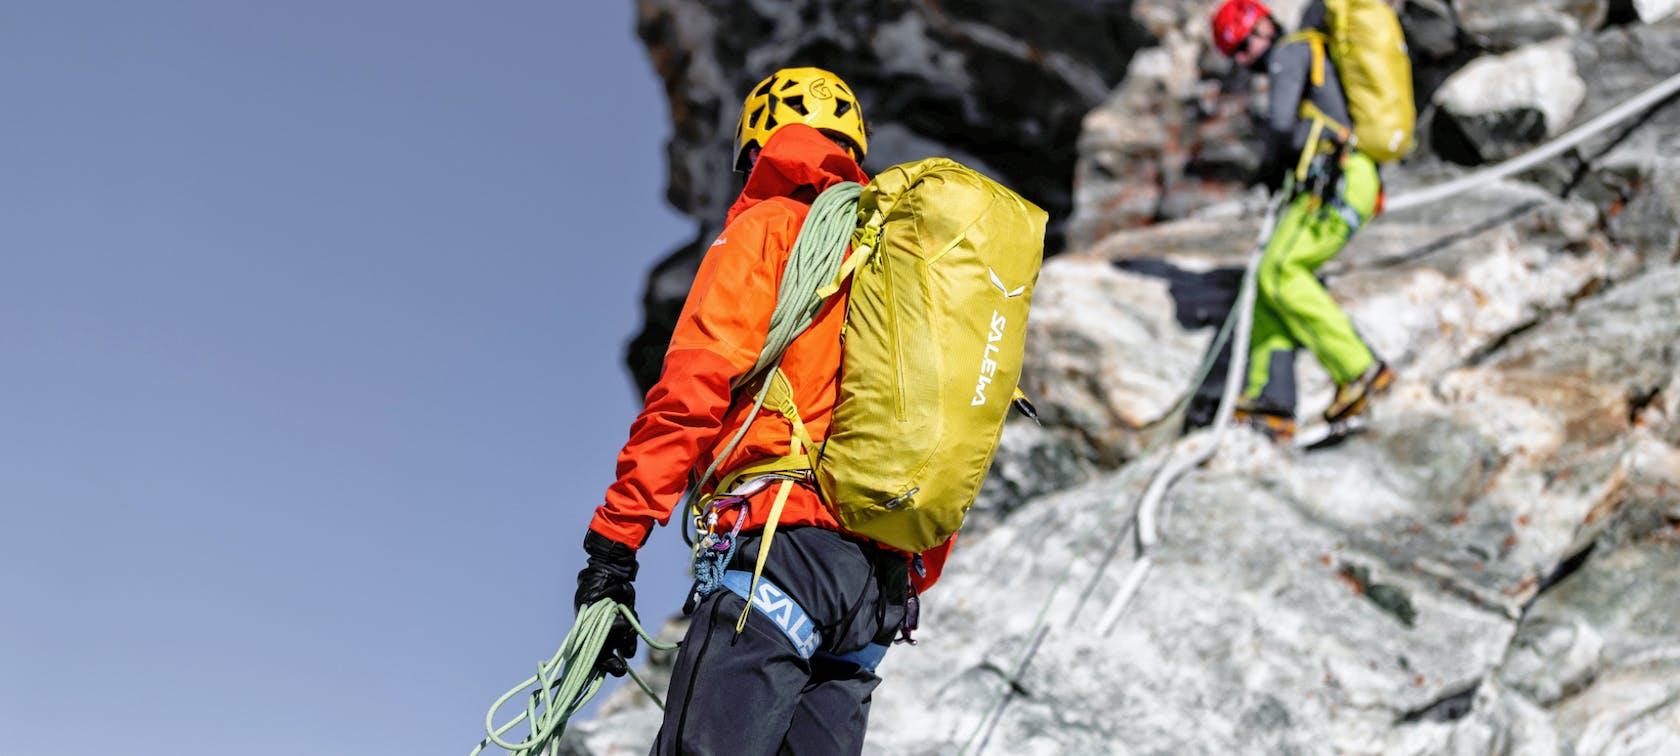 salewa onlineshop arrampicat